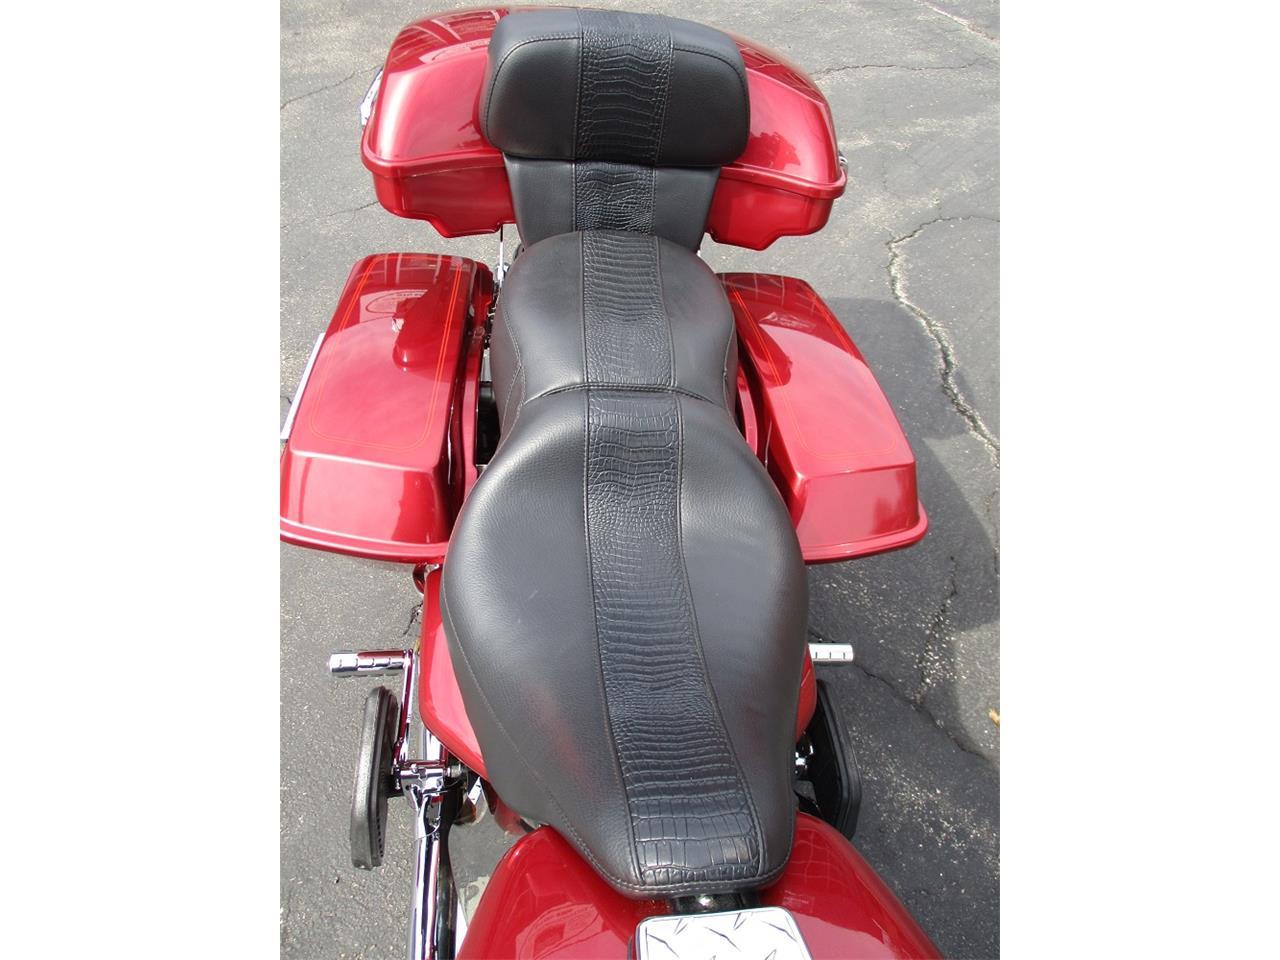 Large Picture of '05 Harley-Davidson Electra Glide - $9,500.00 - PR89